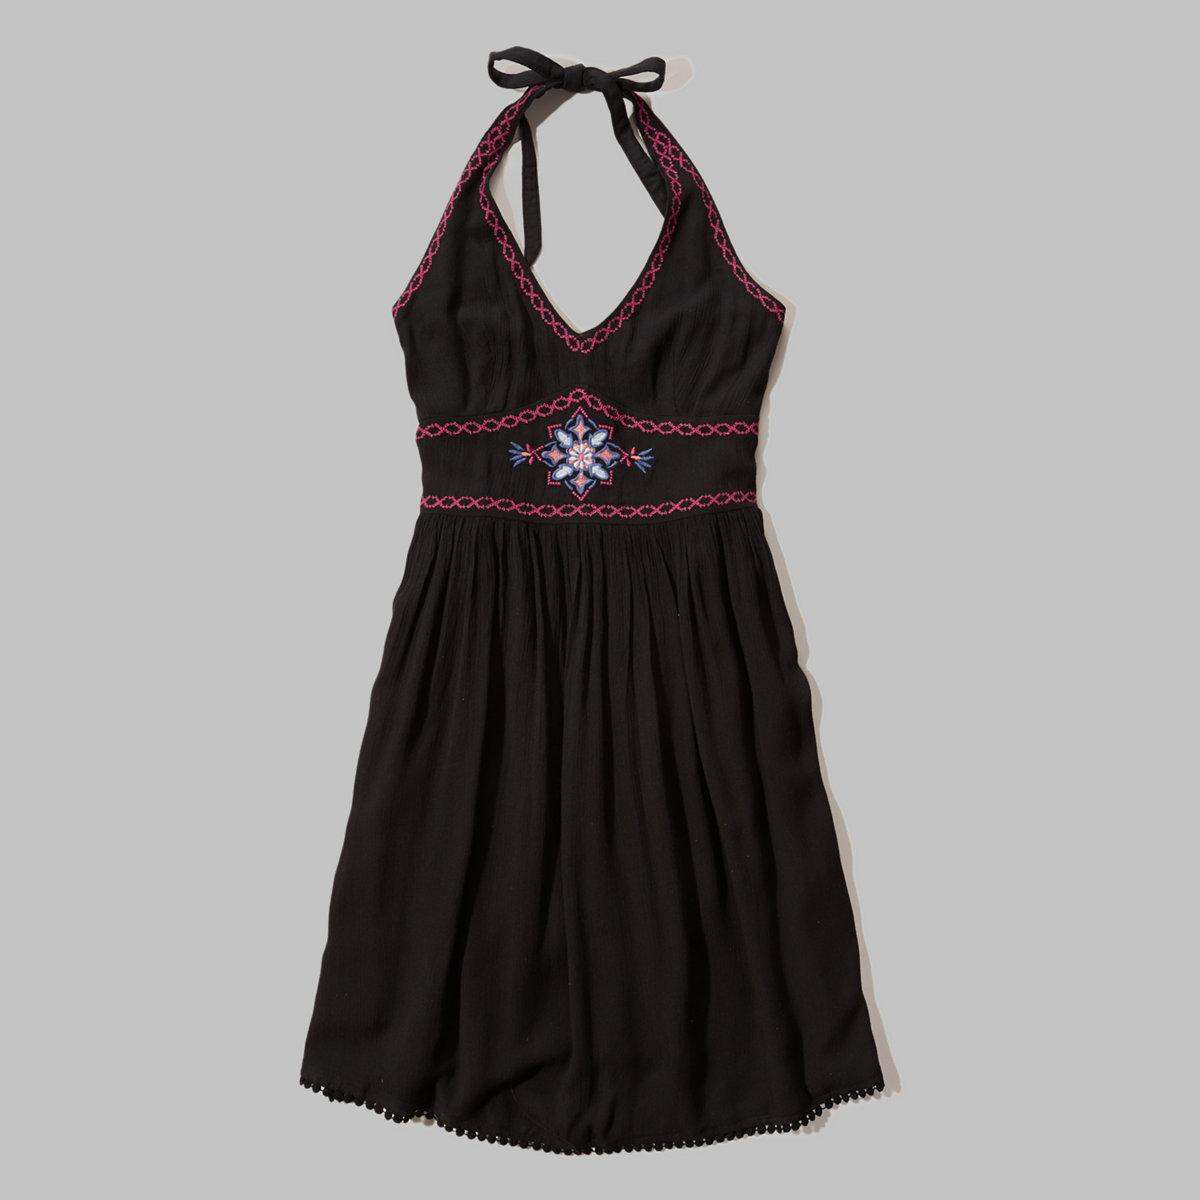 Embroidered Halter Dress